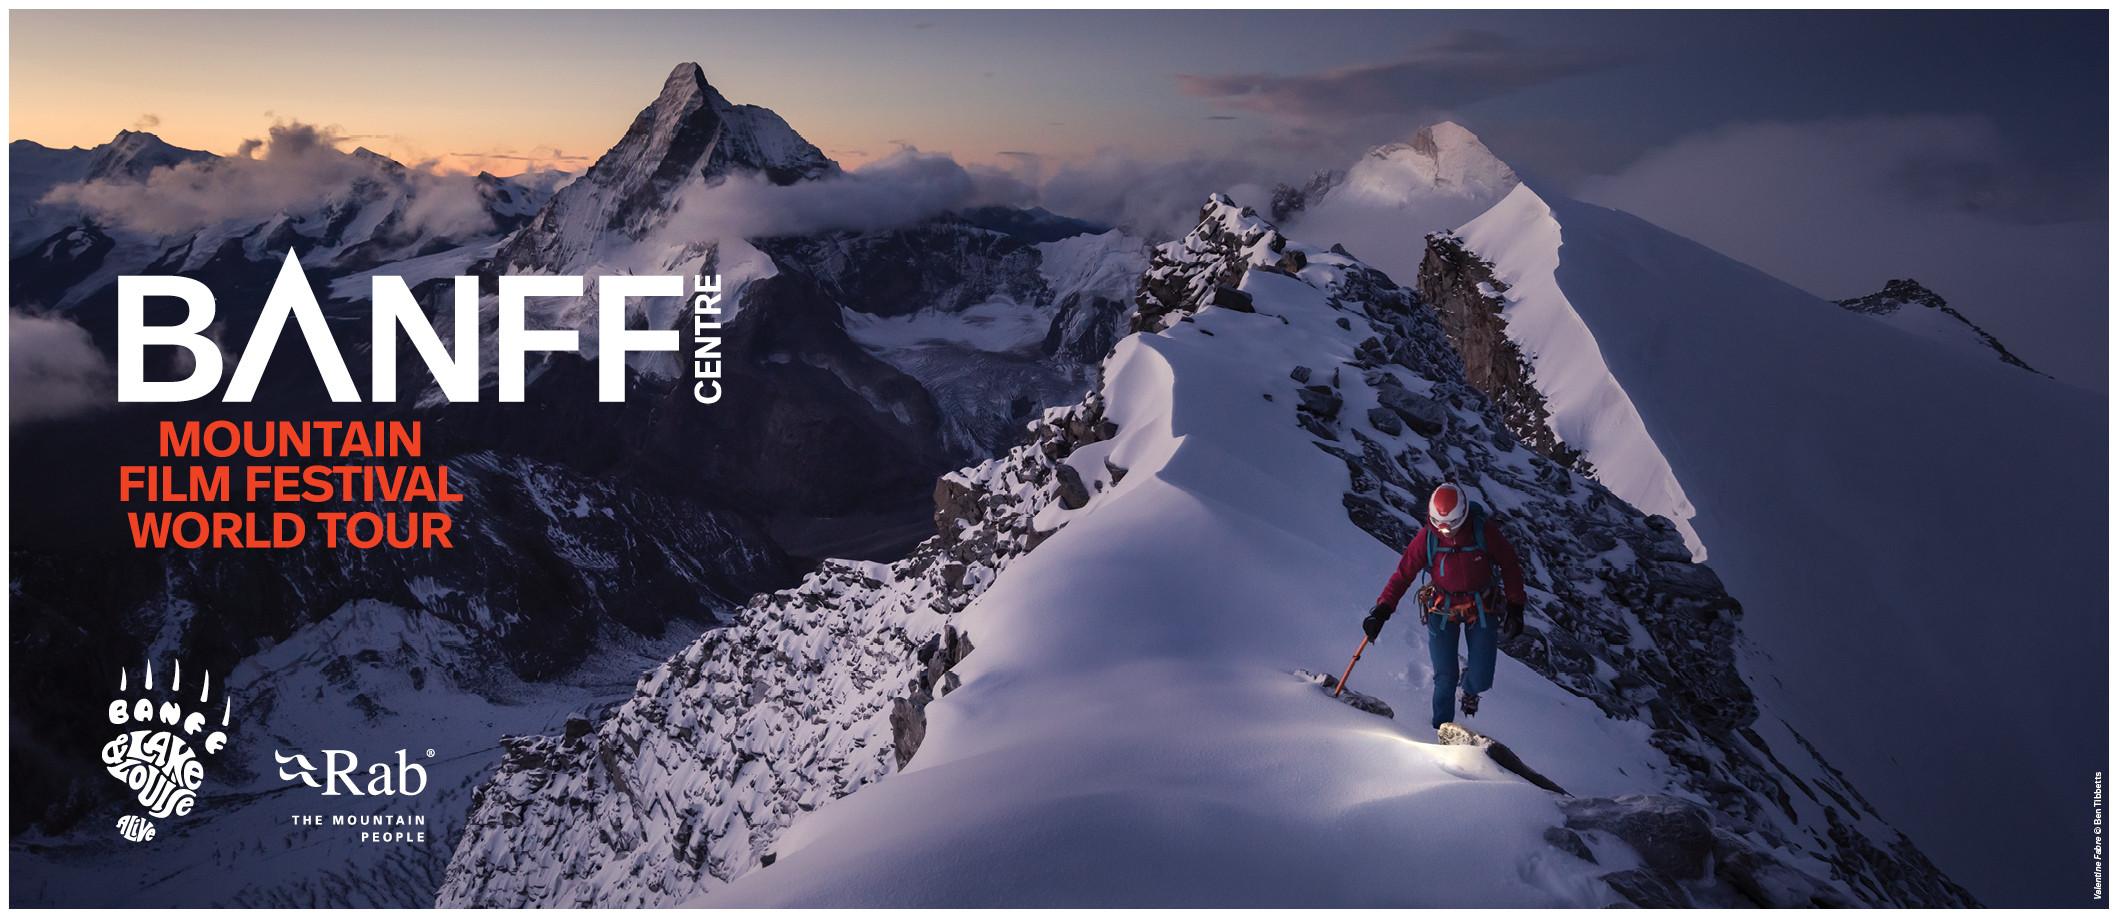 Lost Lake Festival 2020.Banff Mountain Film Festival Connecticut 2020